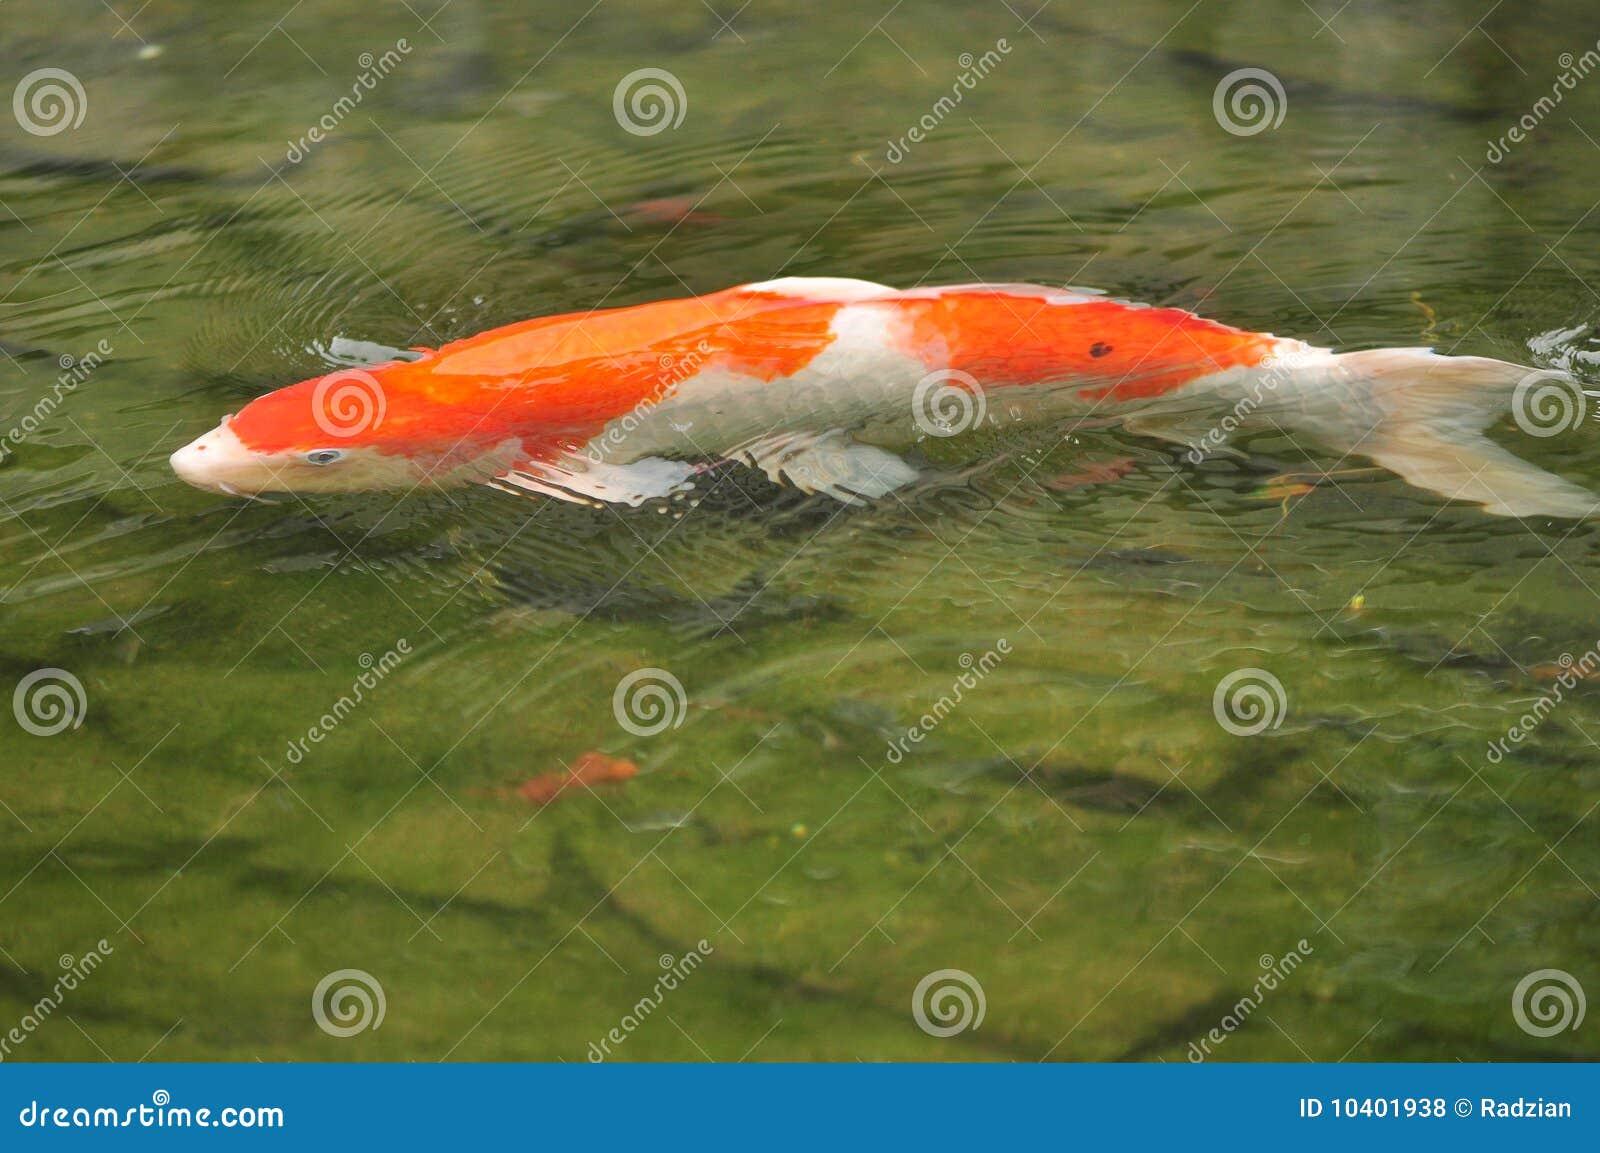 Koi carp fish royalty free stock photos image 10401938 for Fraie carpe koi